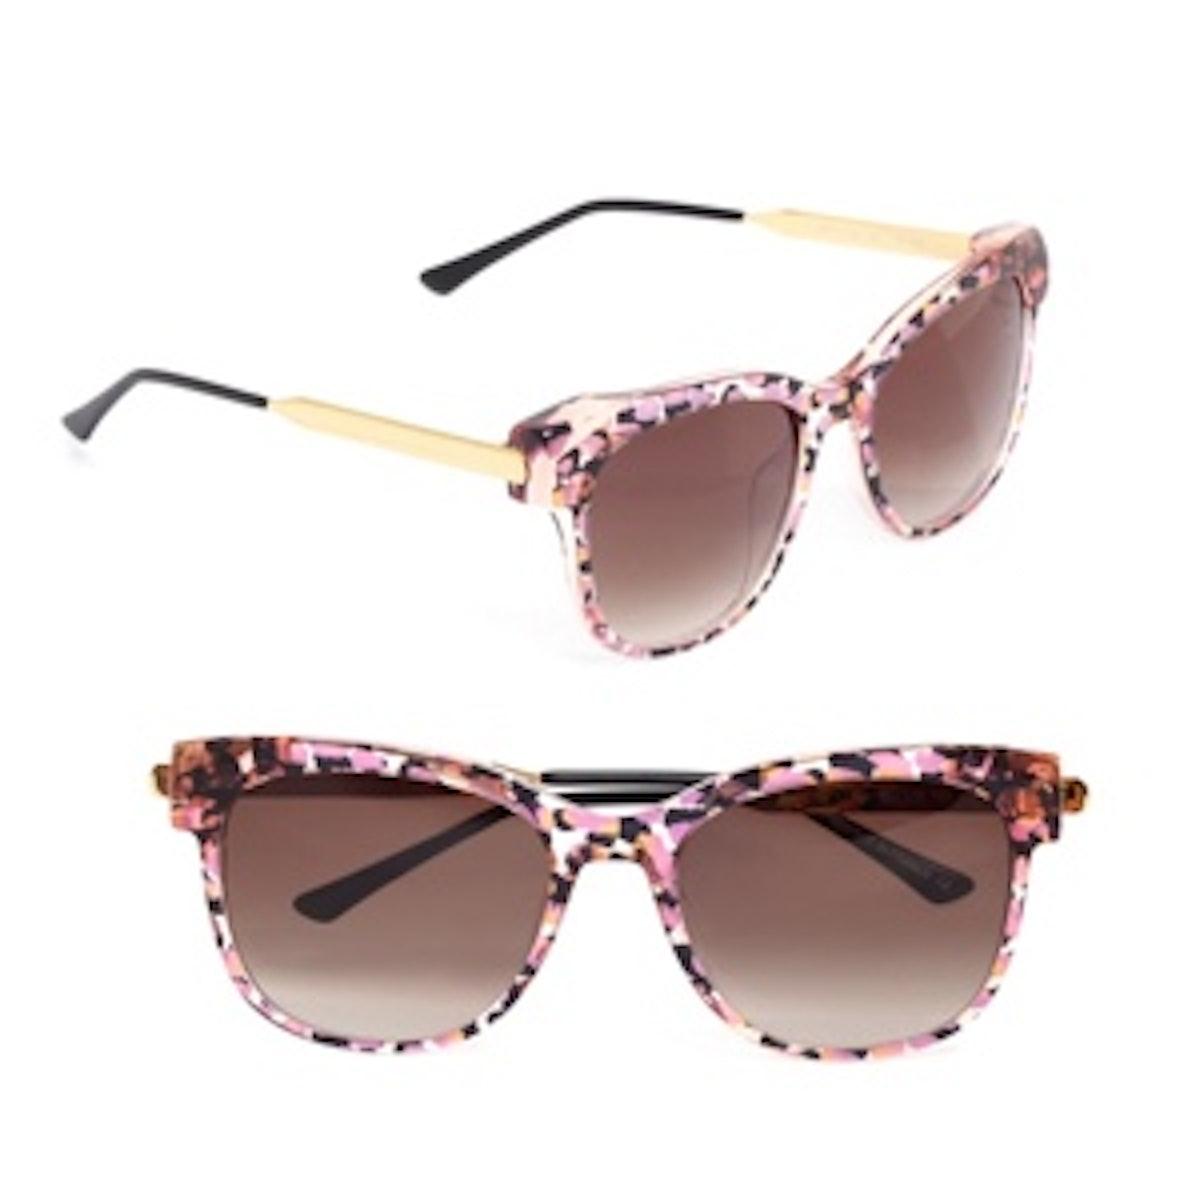 Lippy Round-Frame Sunglasses